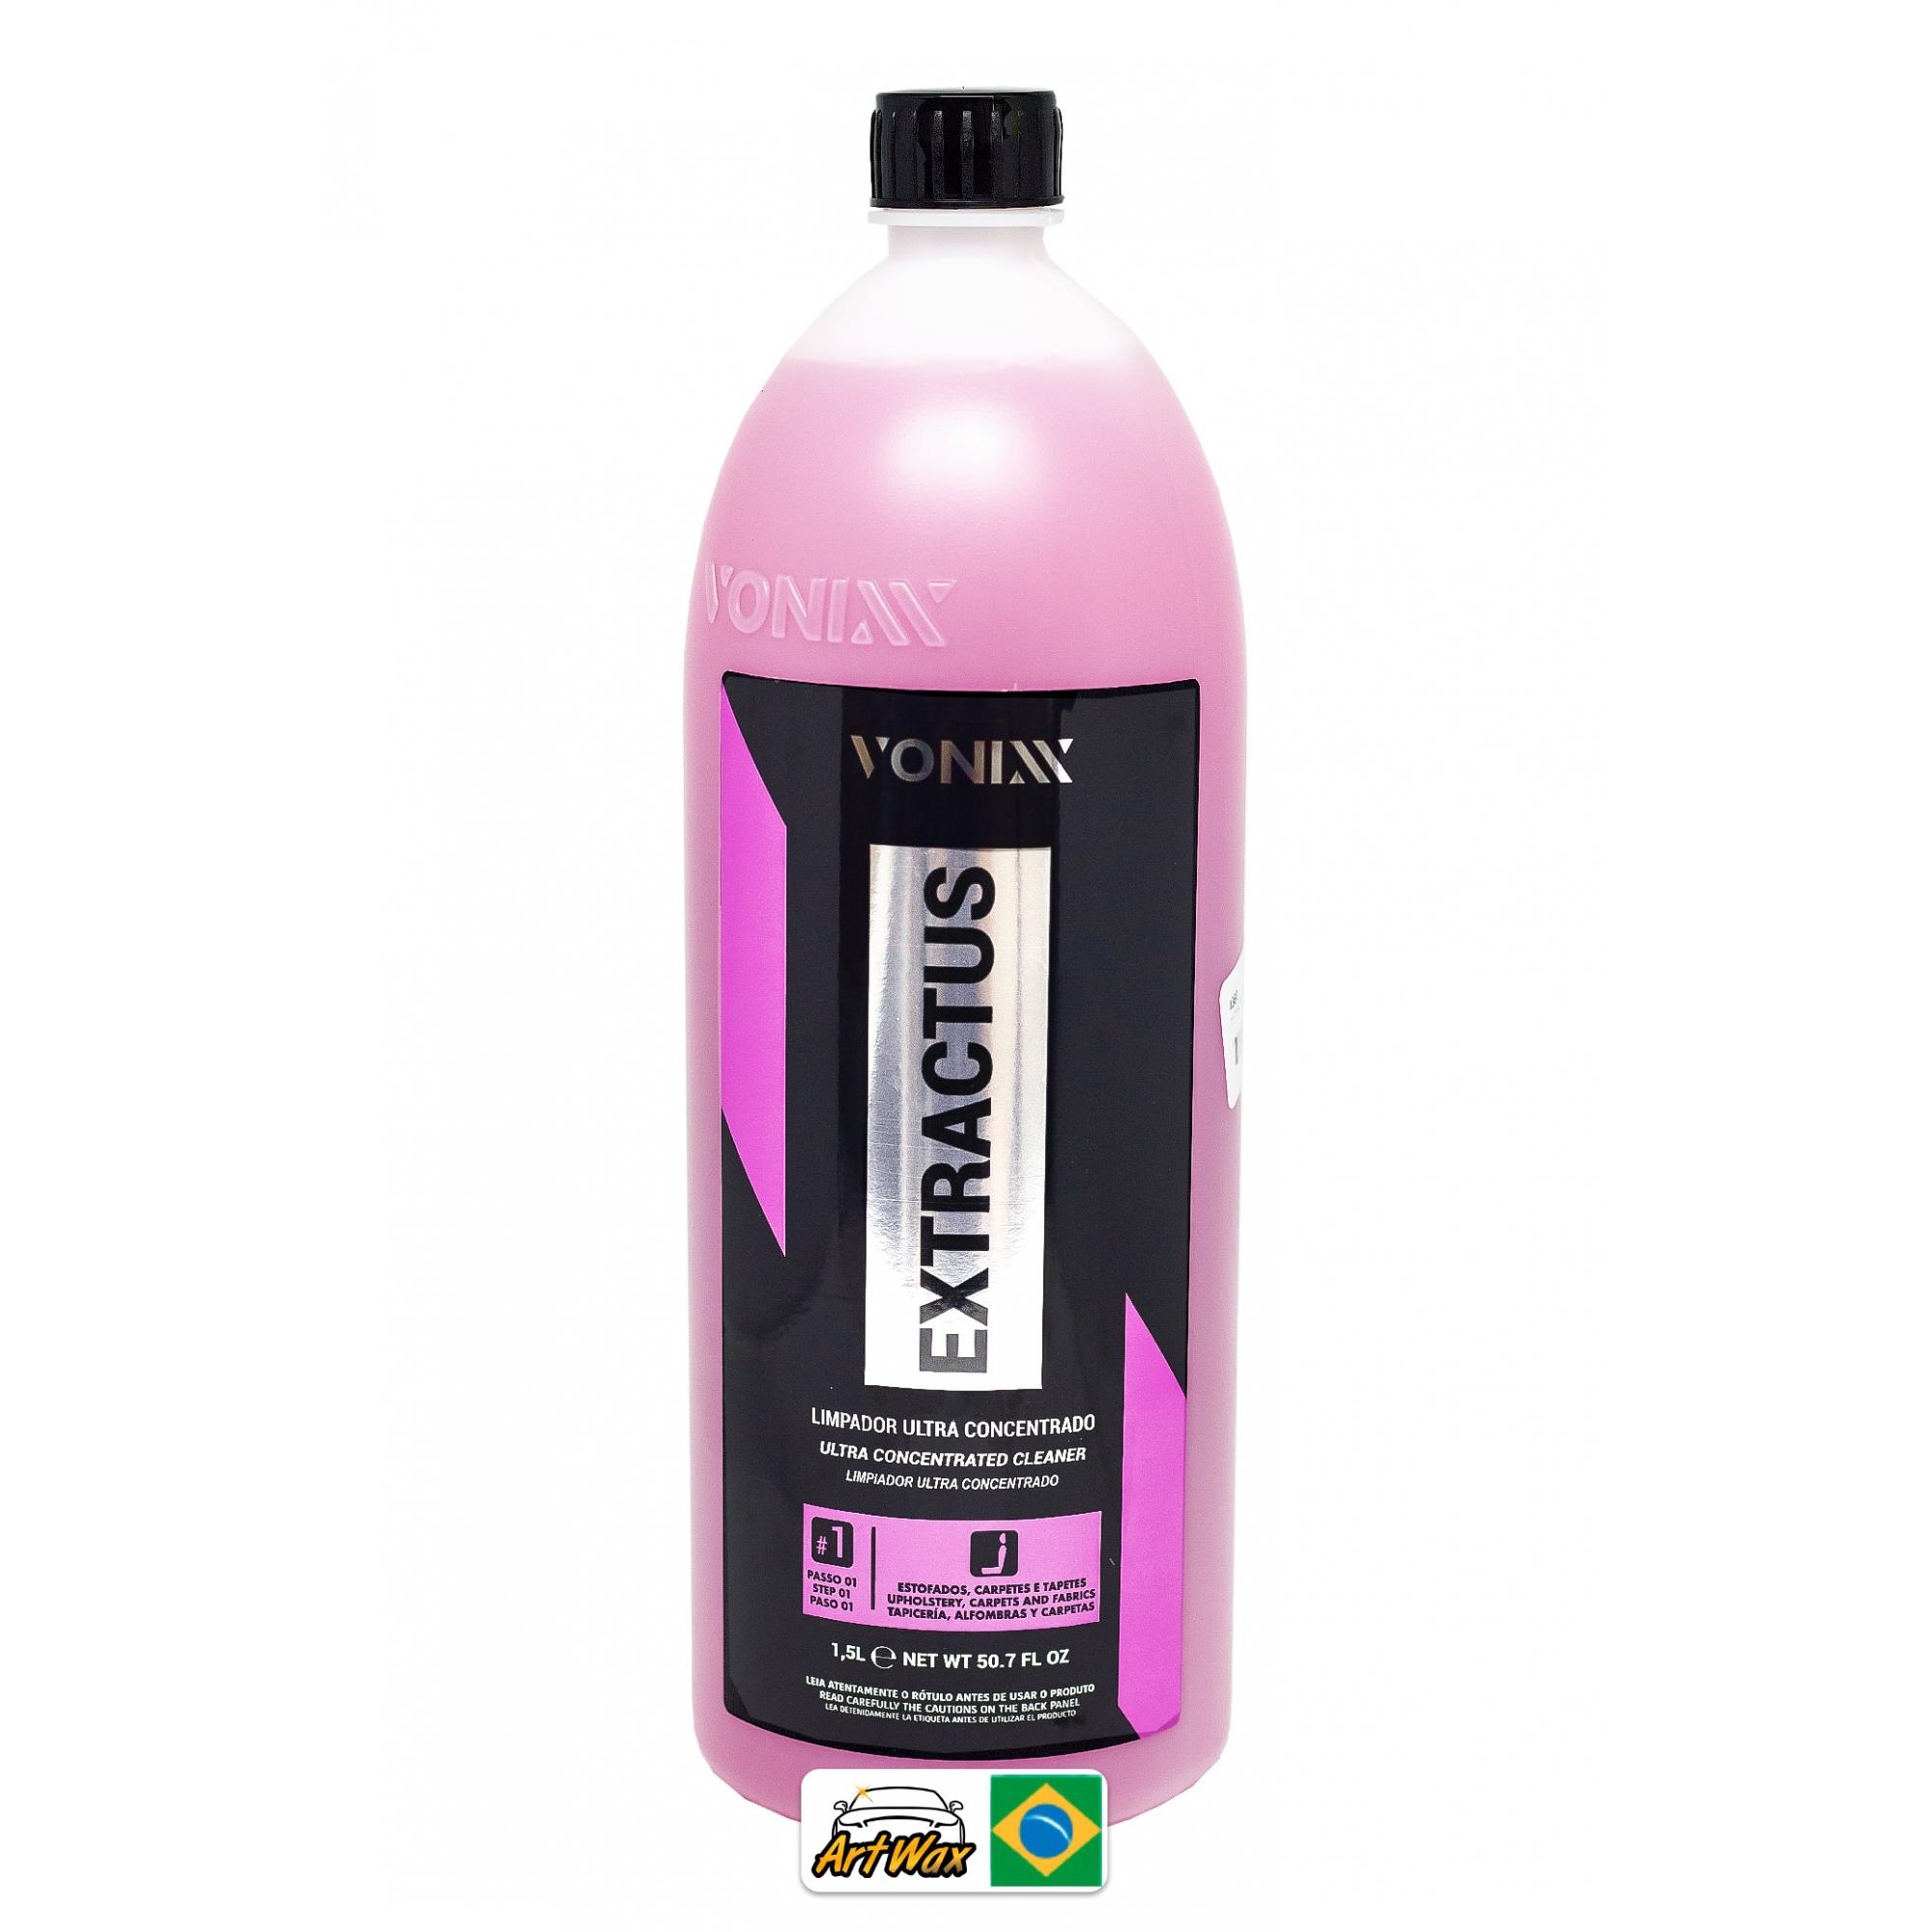 Vonixx Extractus 1,5L - Limpador Concentrado Estofados e Carpetes Extratora = VSC 1